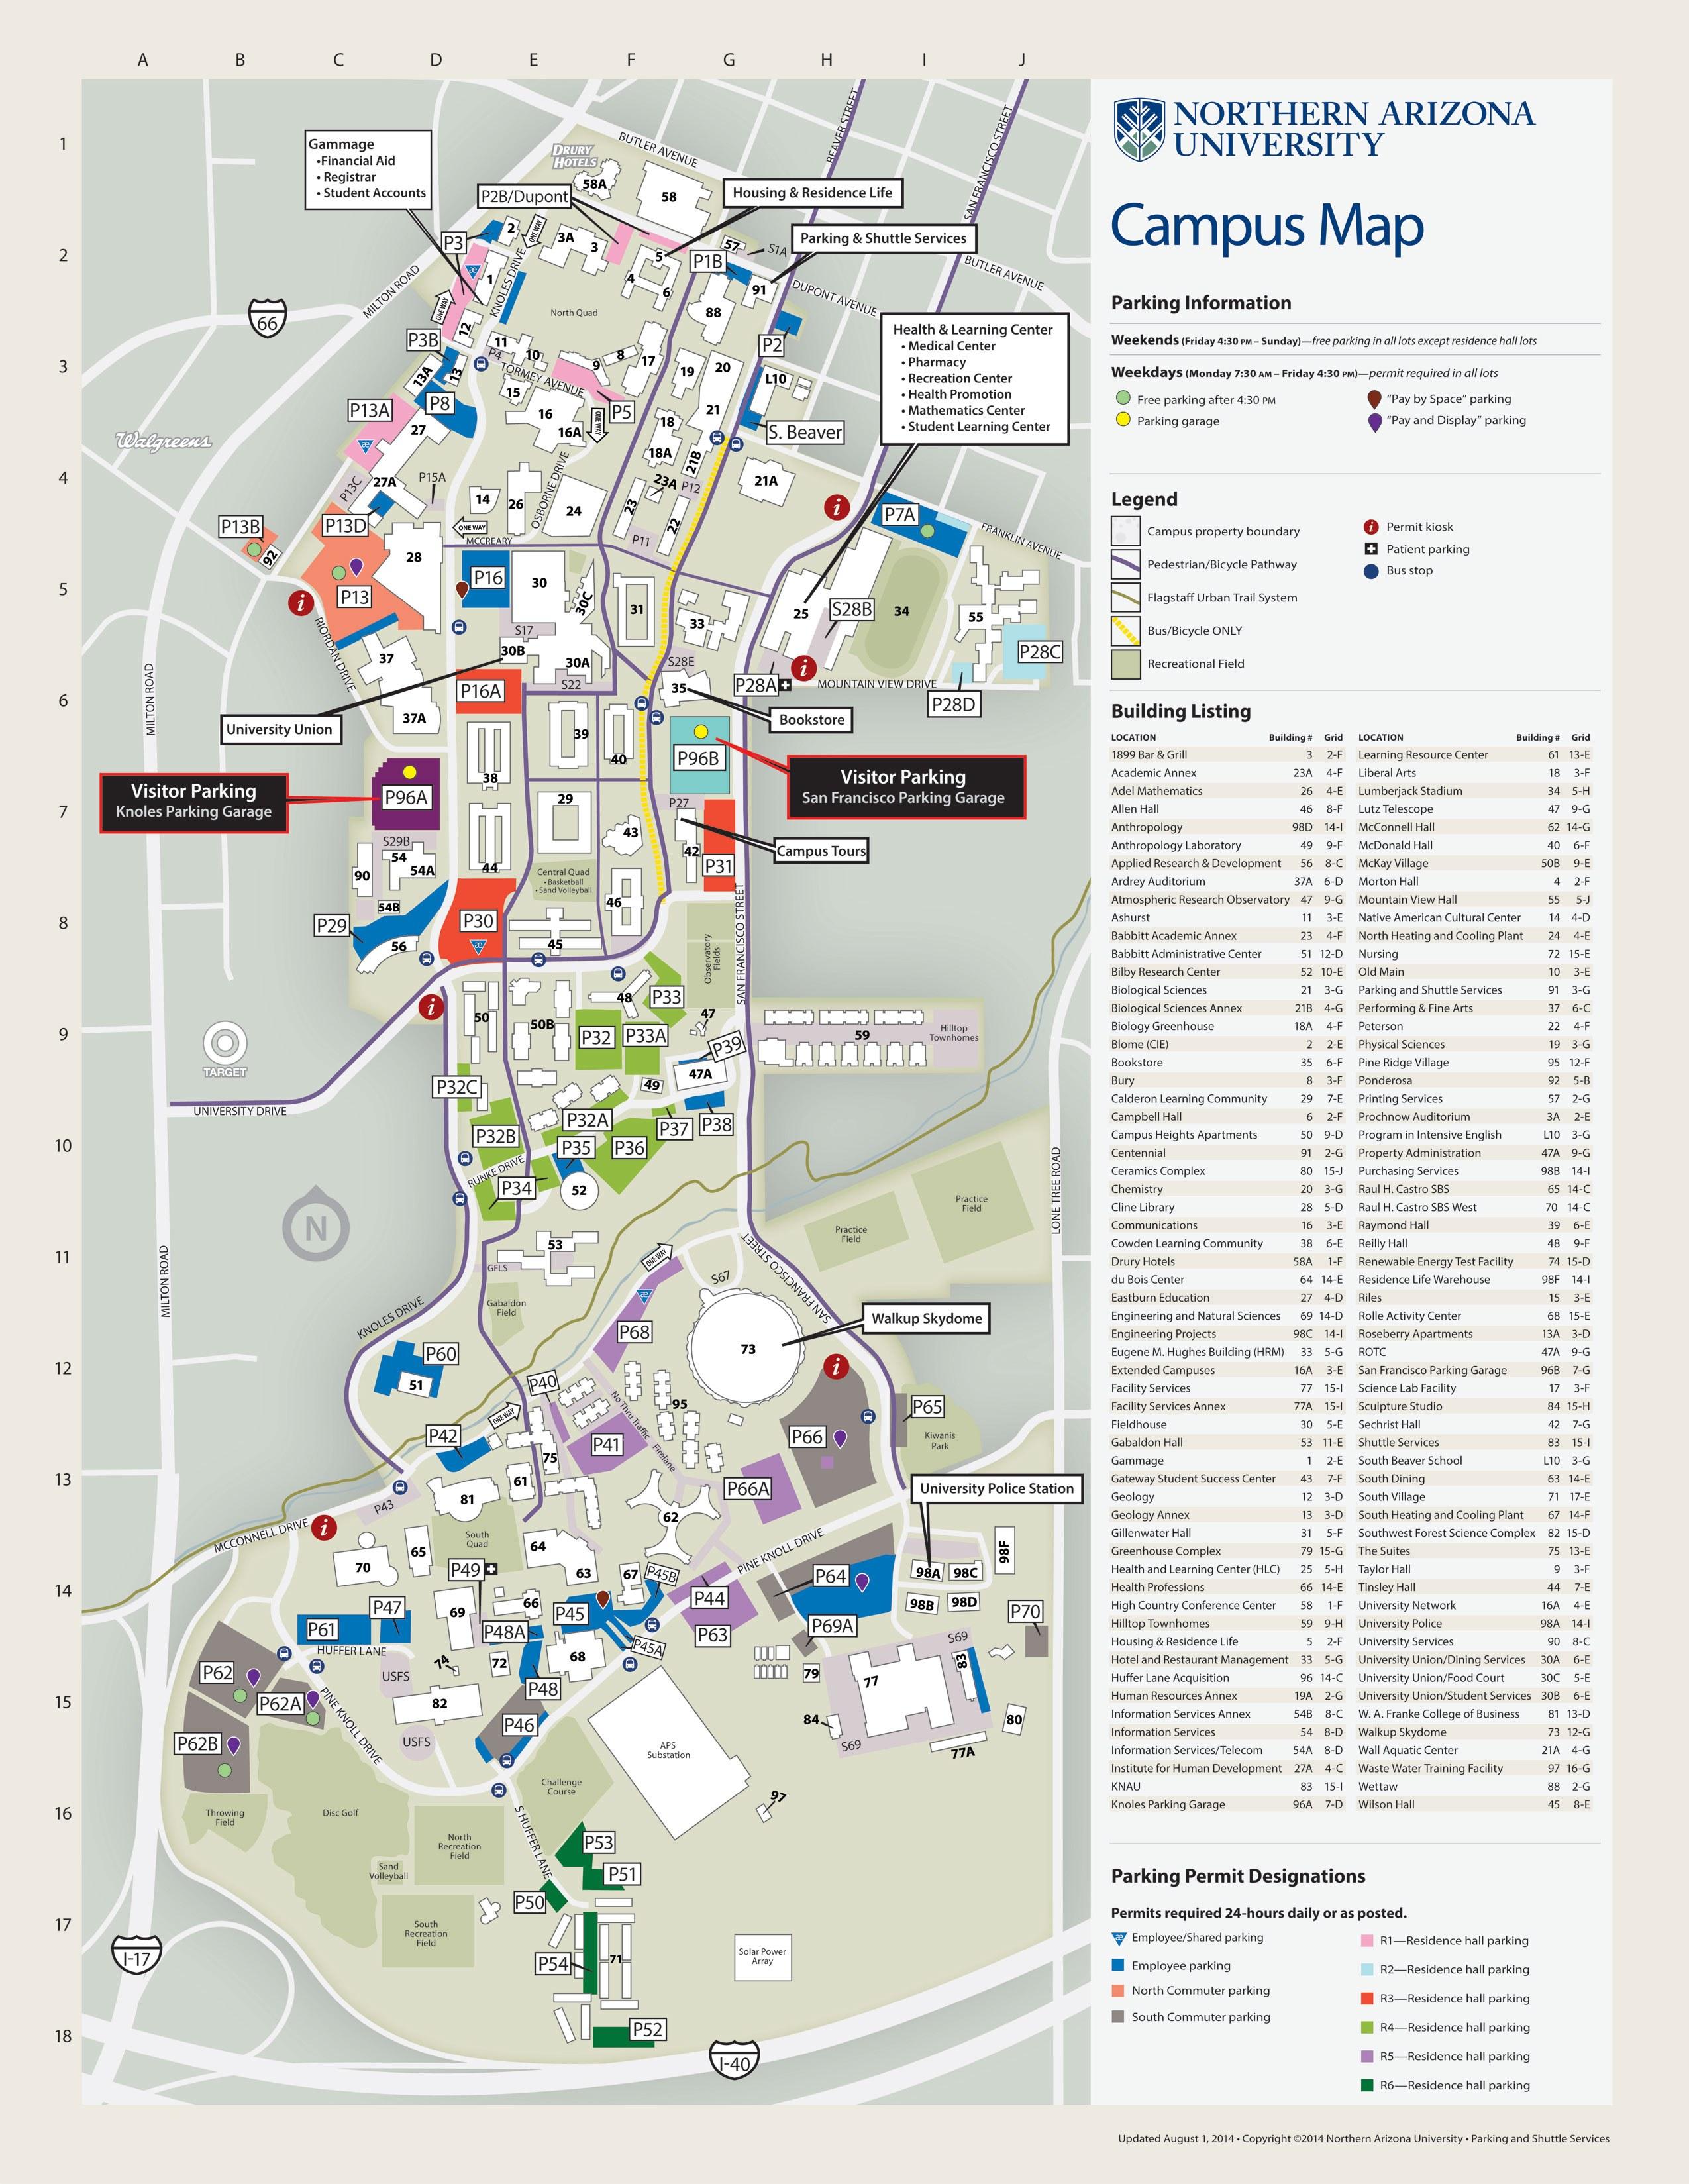 photograph about University of Arizona Campus Map Printable named Flagstaff, Arizona Maps - Come across Flagstaff